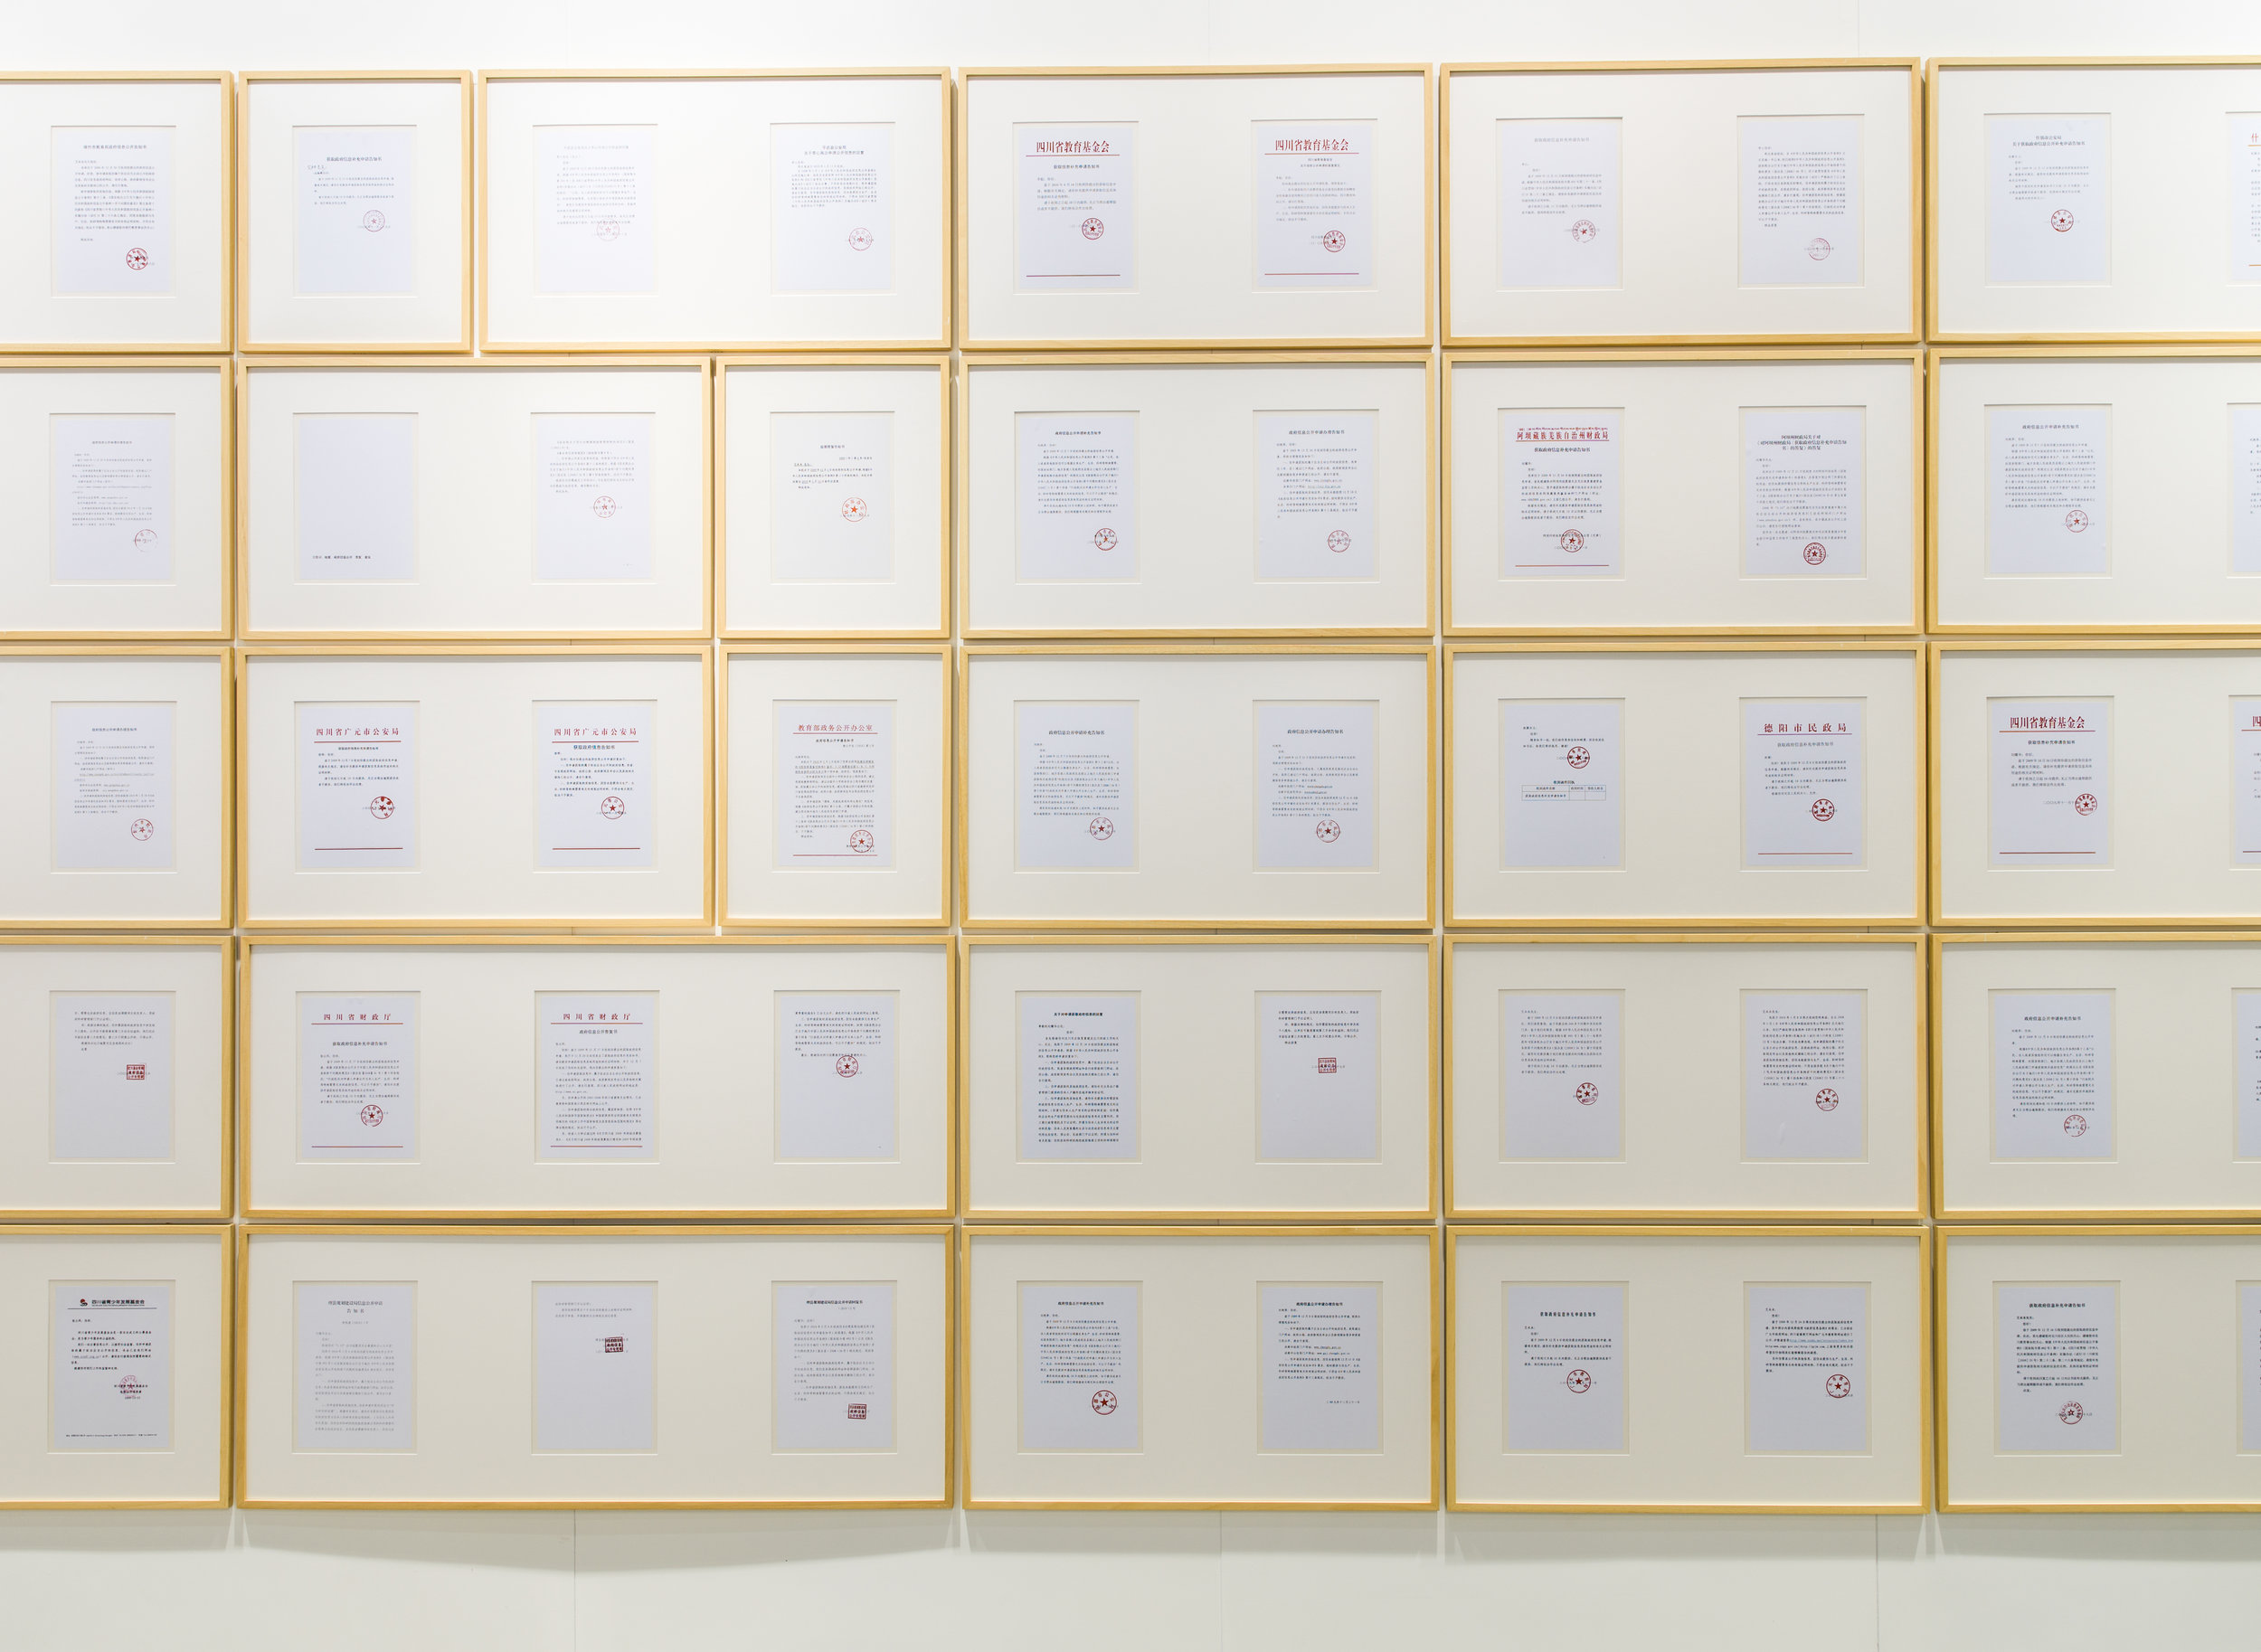 Cong, 2008-2011 (Installation view at the Hong Kong International Art Fair, 2012) - 2.jpg